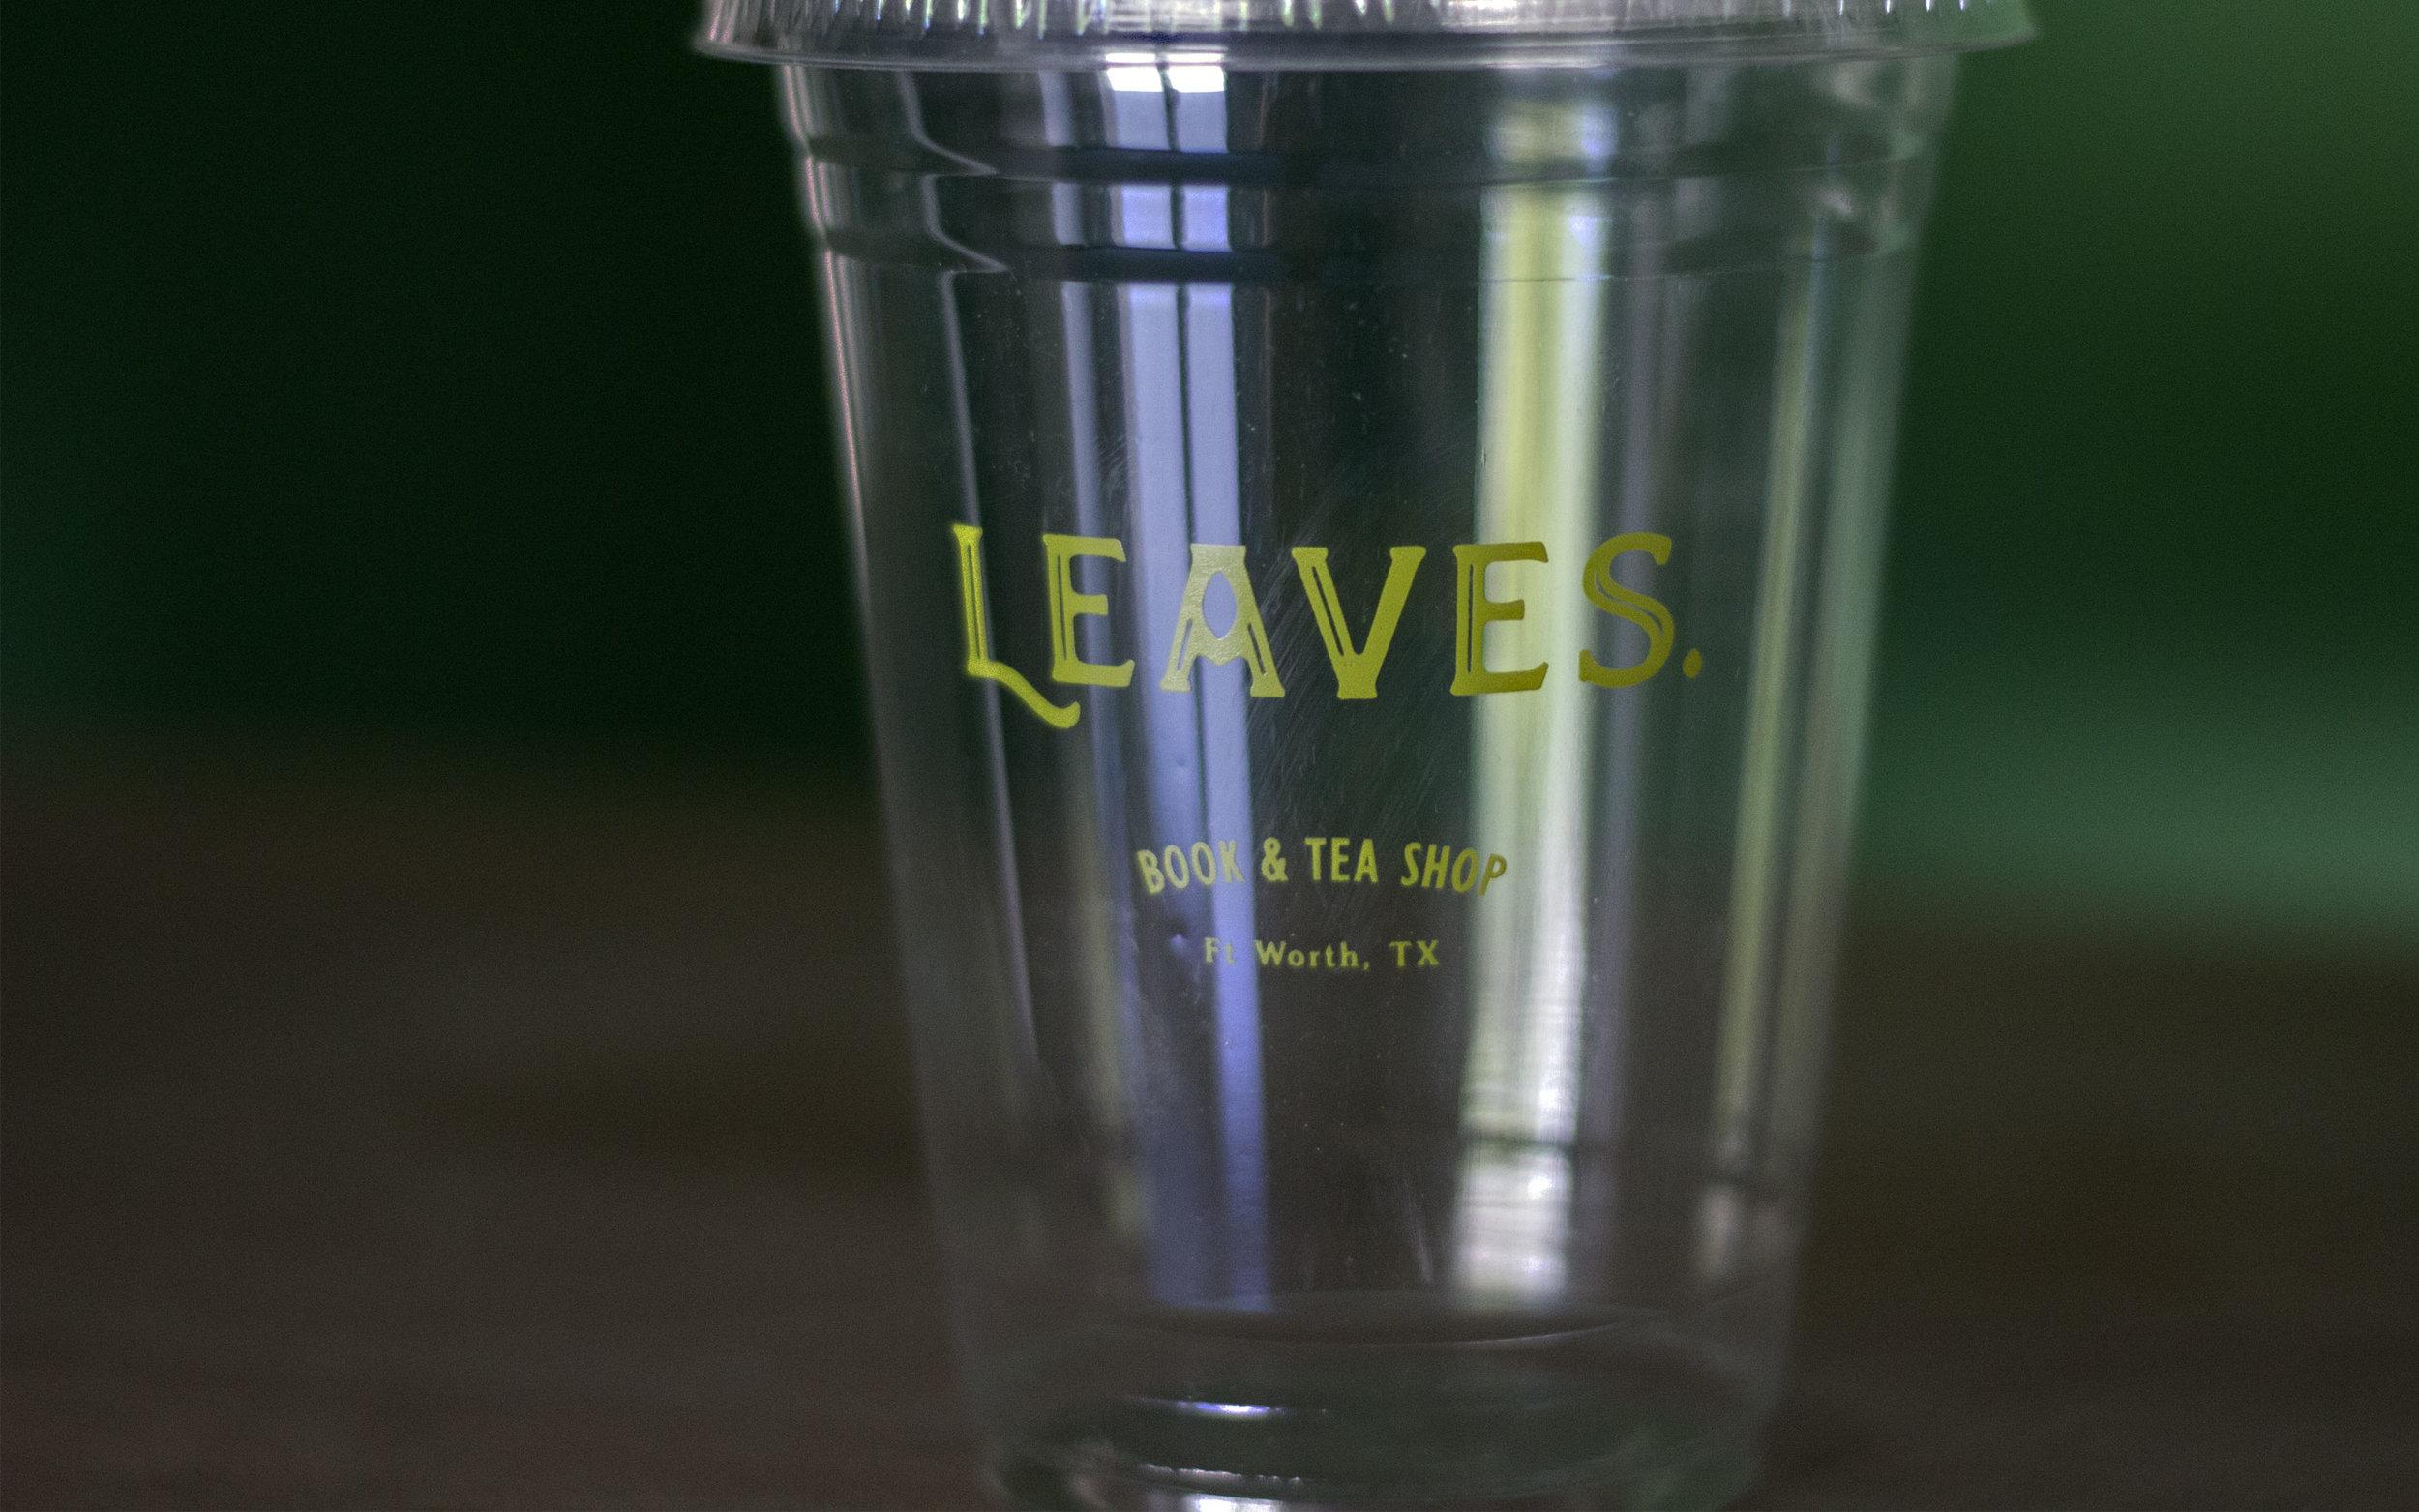 MGC_Leaves_RGB_togo-tea-cup_1.jpg